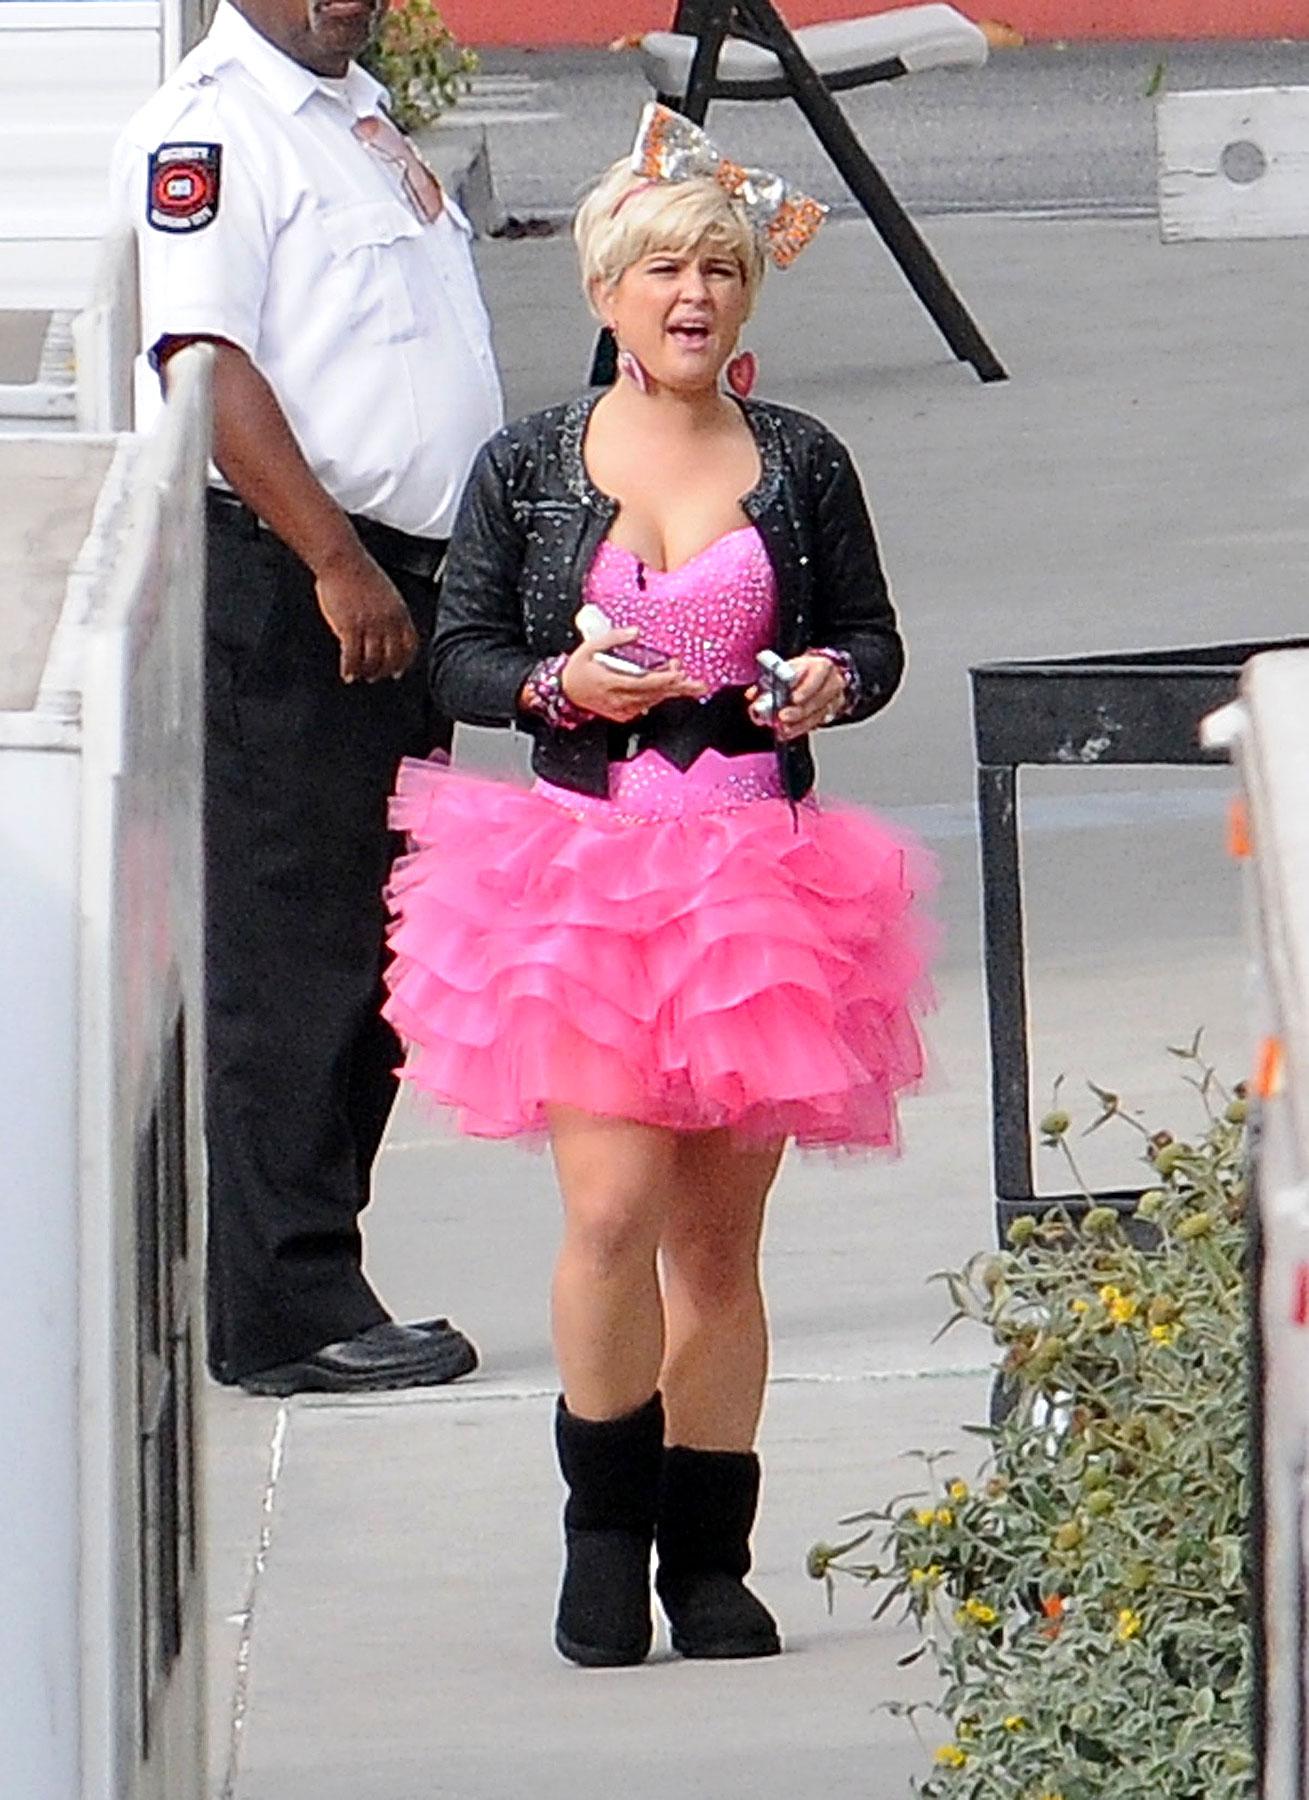 PHOTO GALLERY: Kelly Osbourne Gears Up to Dance